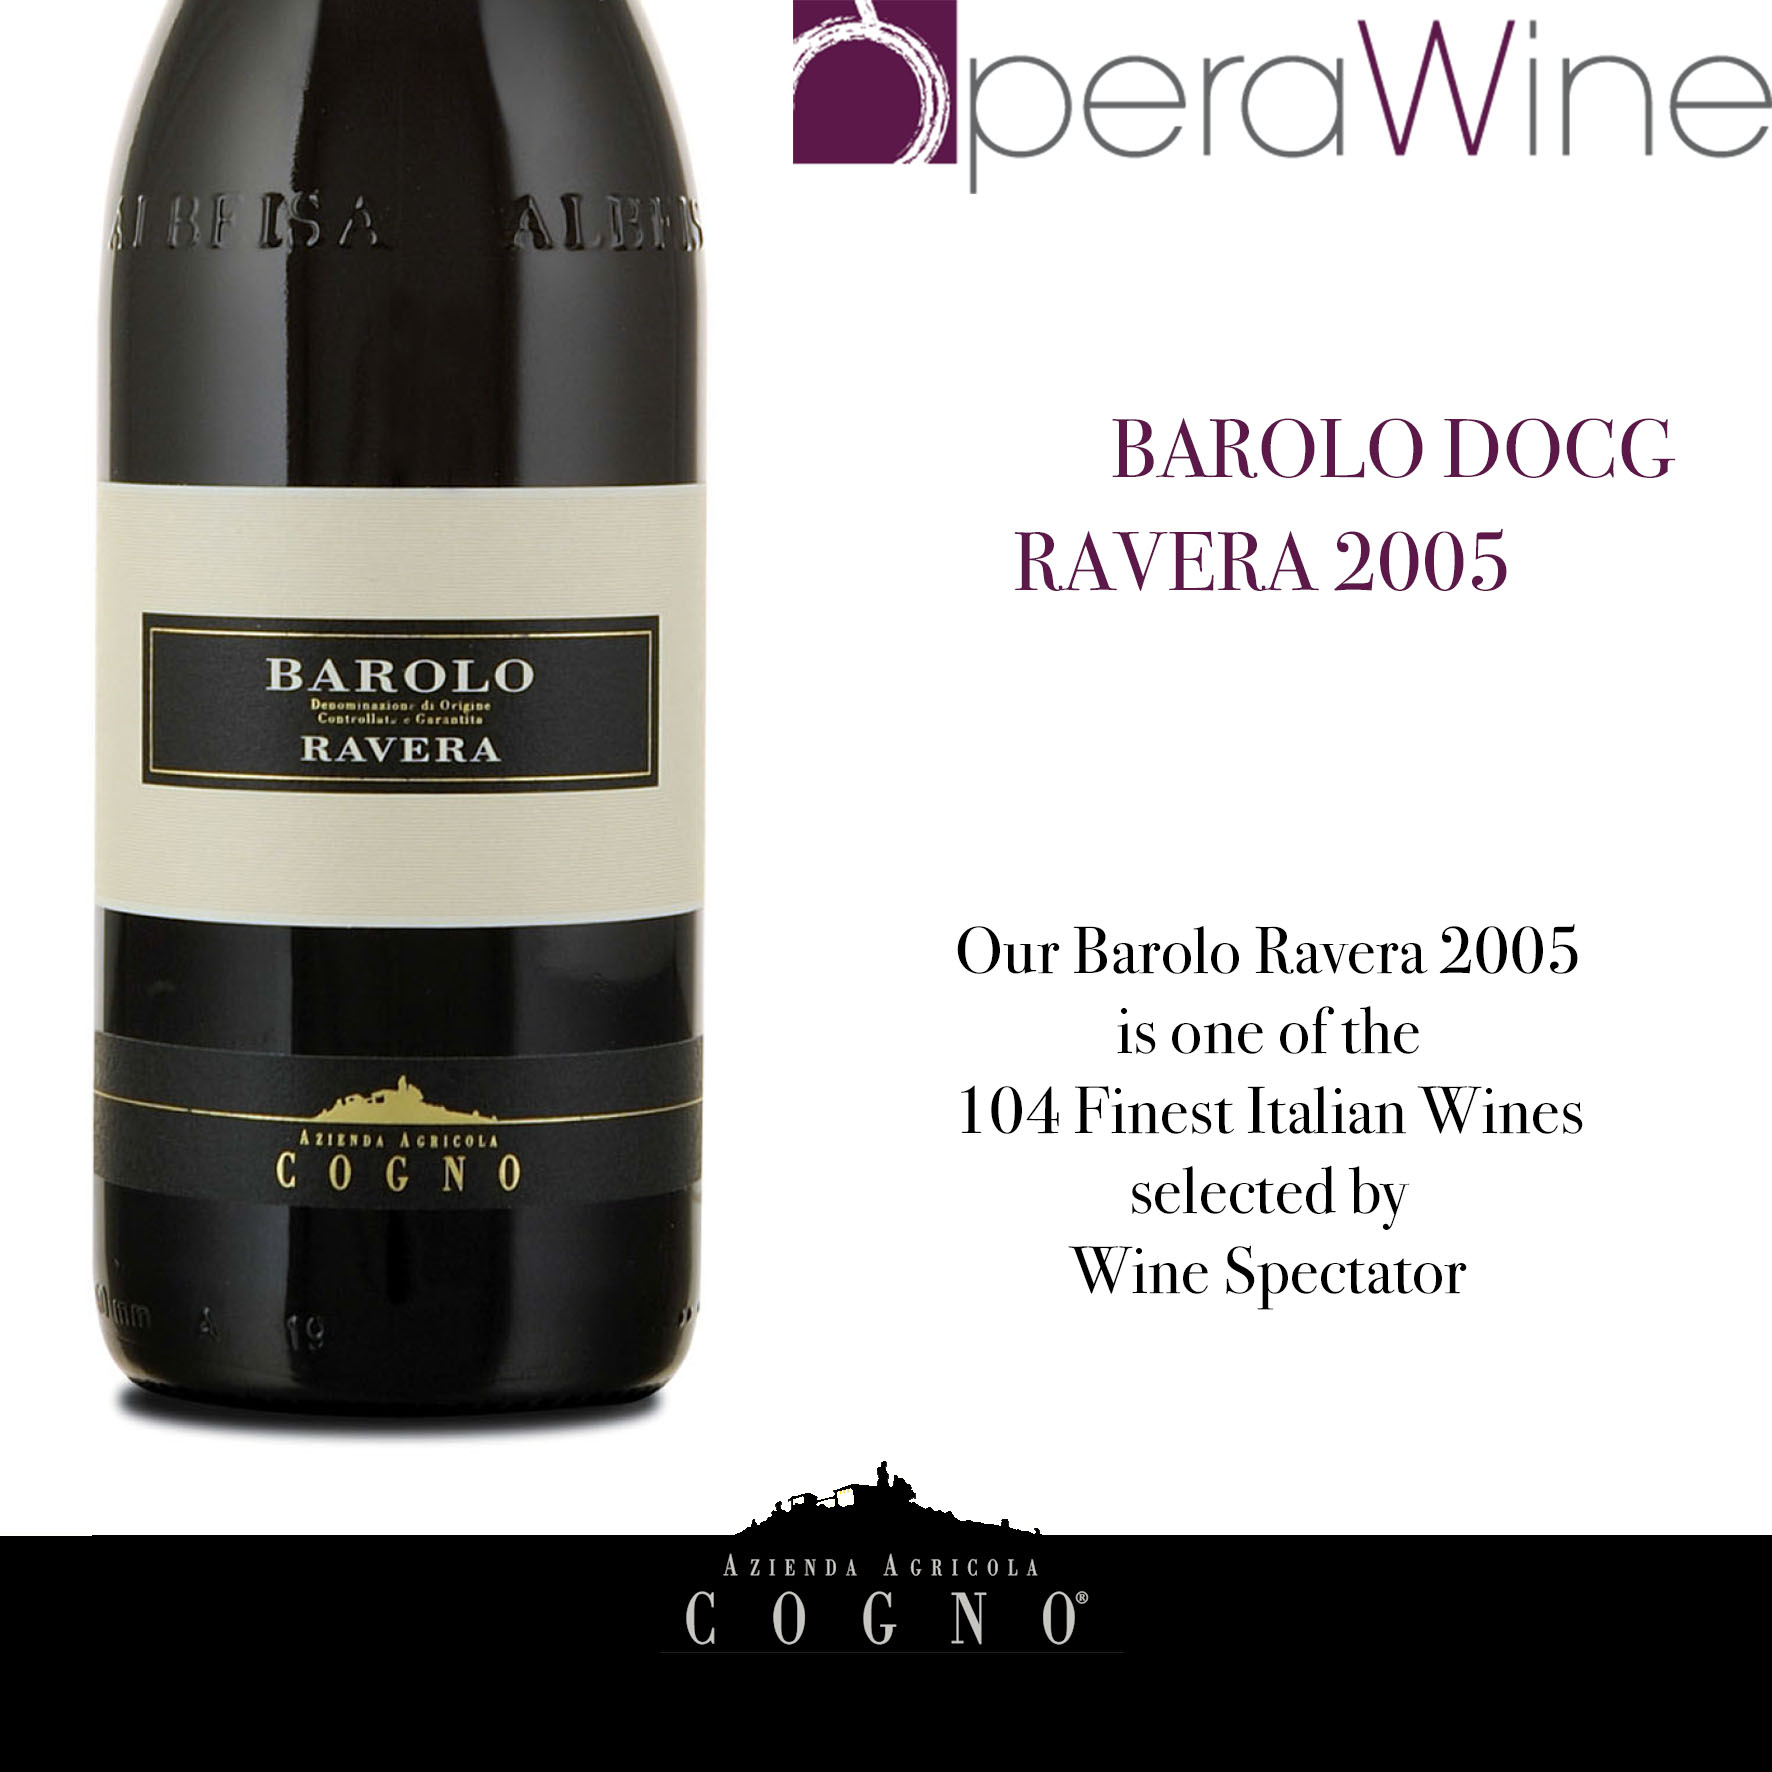 OperaWine 2017: Barolo Ravera 2005 is among the finest 104 Italian wines of the world